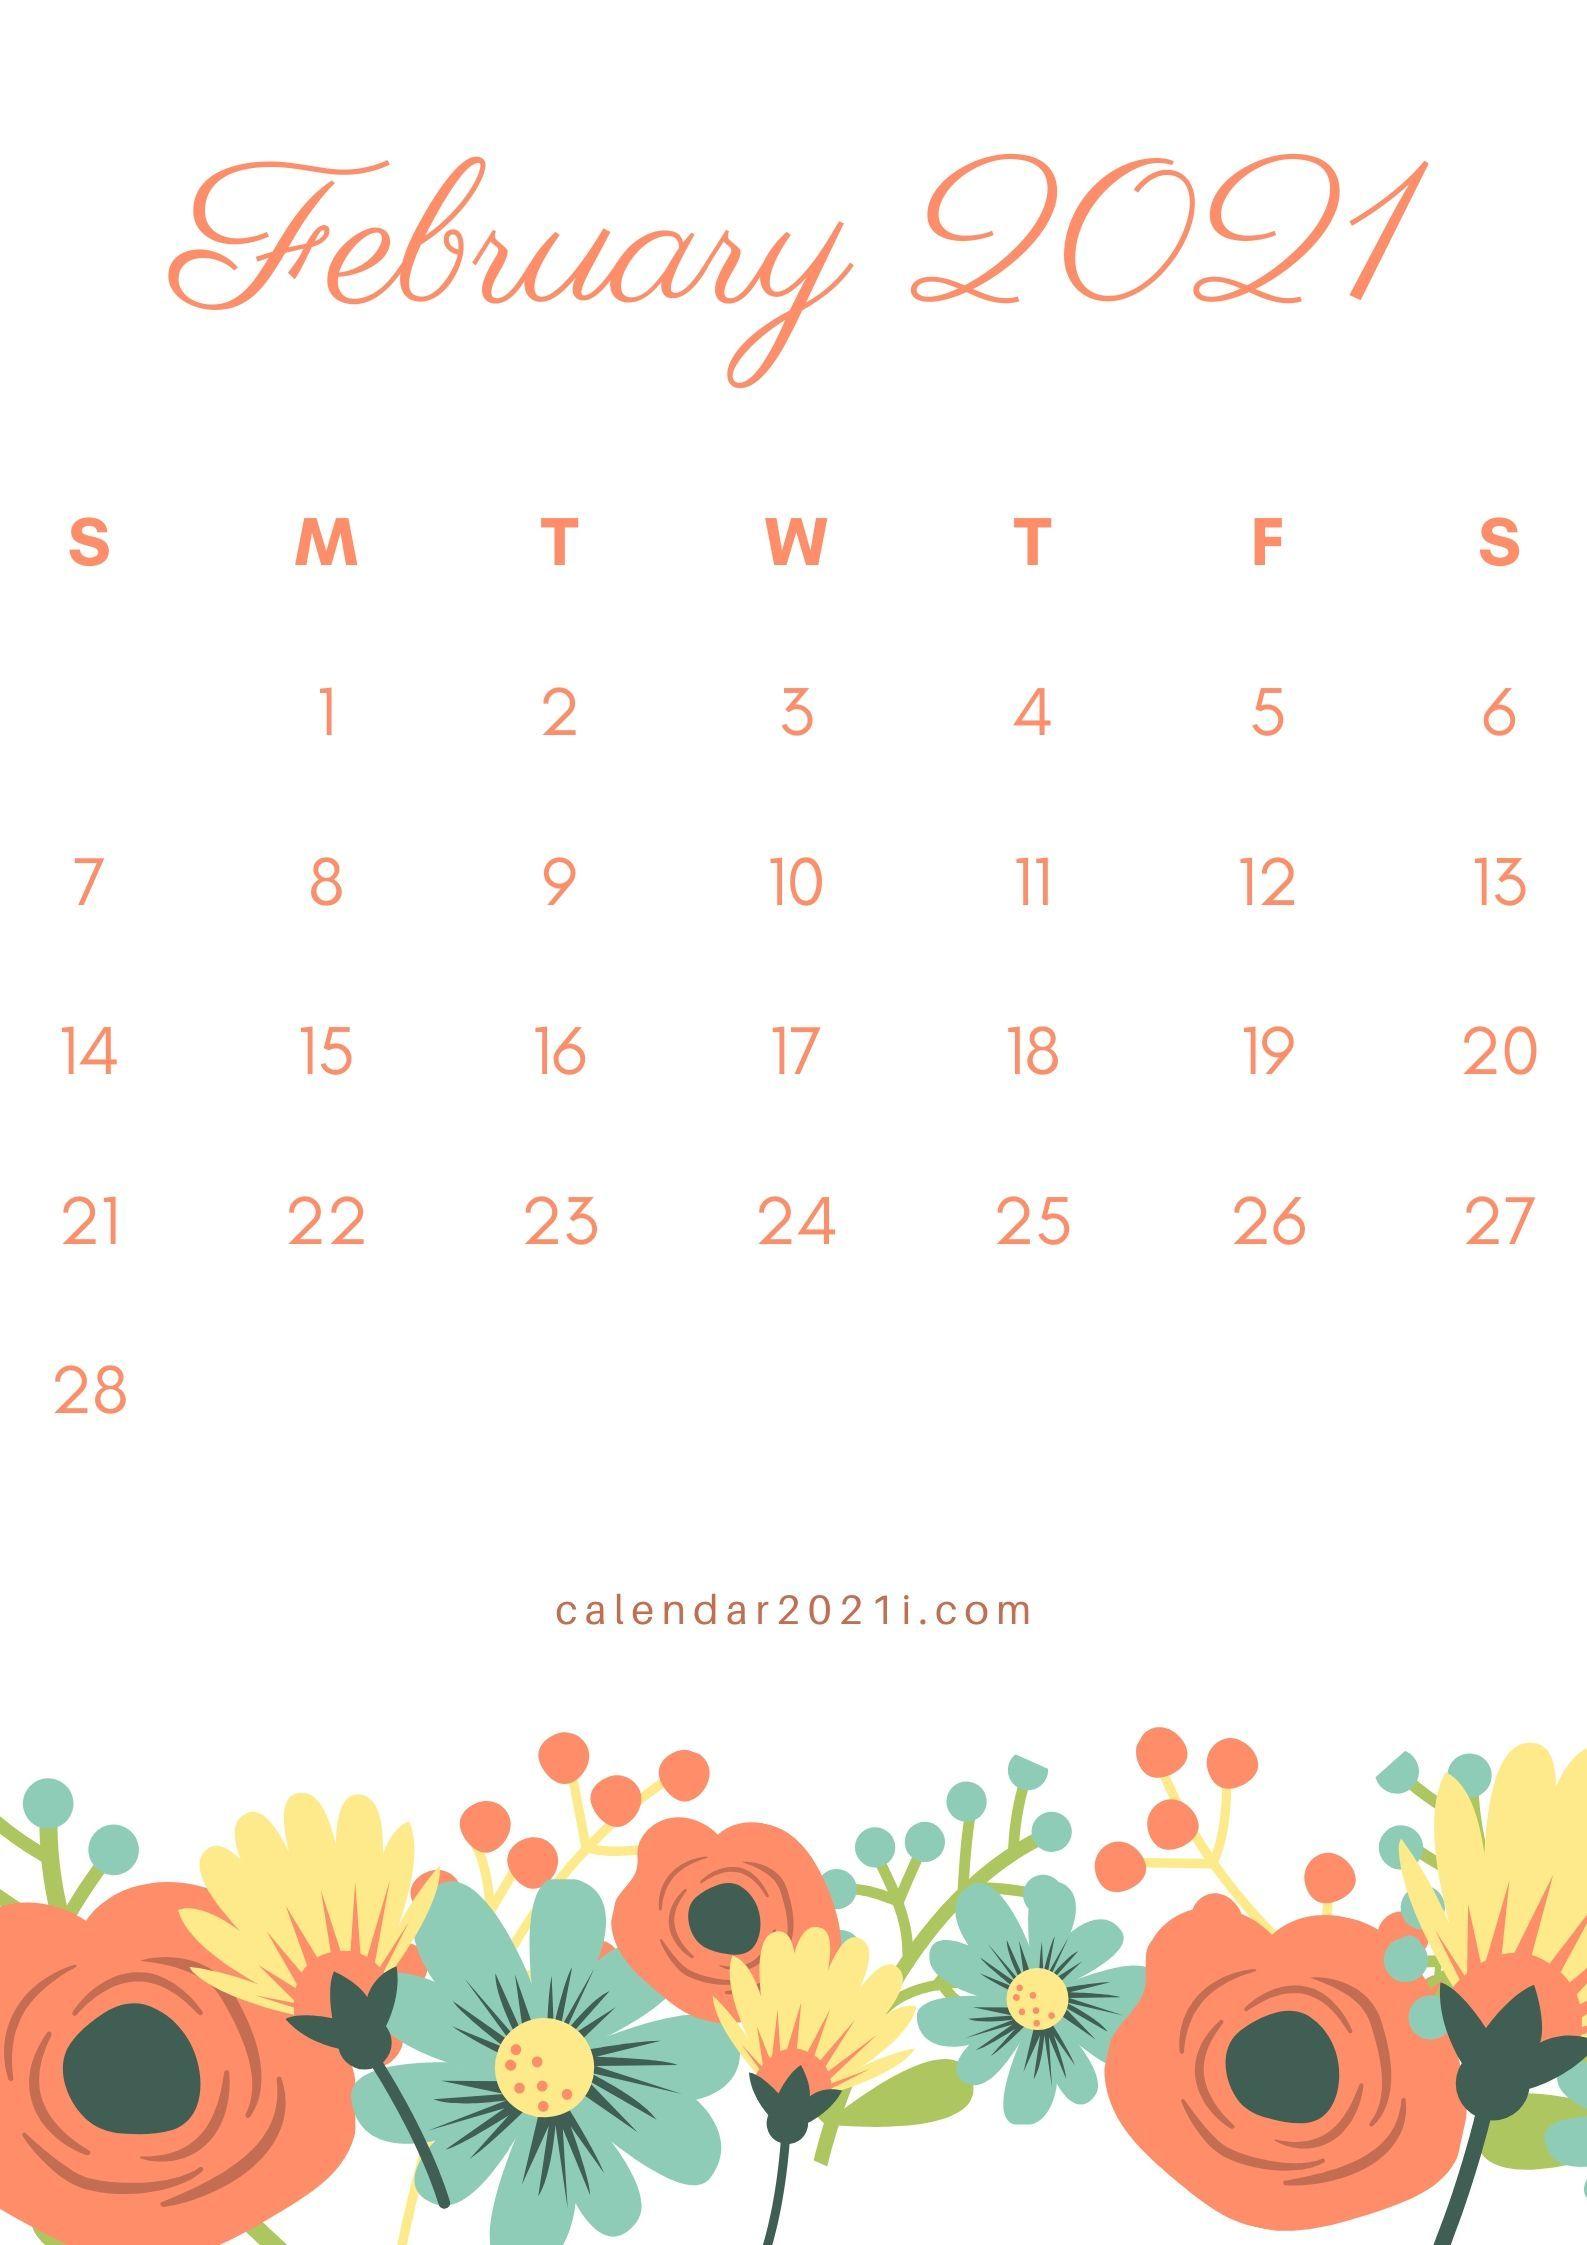 February 2021 Calendar Wallpapers Wallpaper Cave